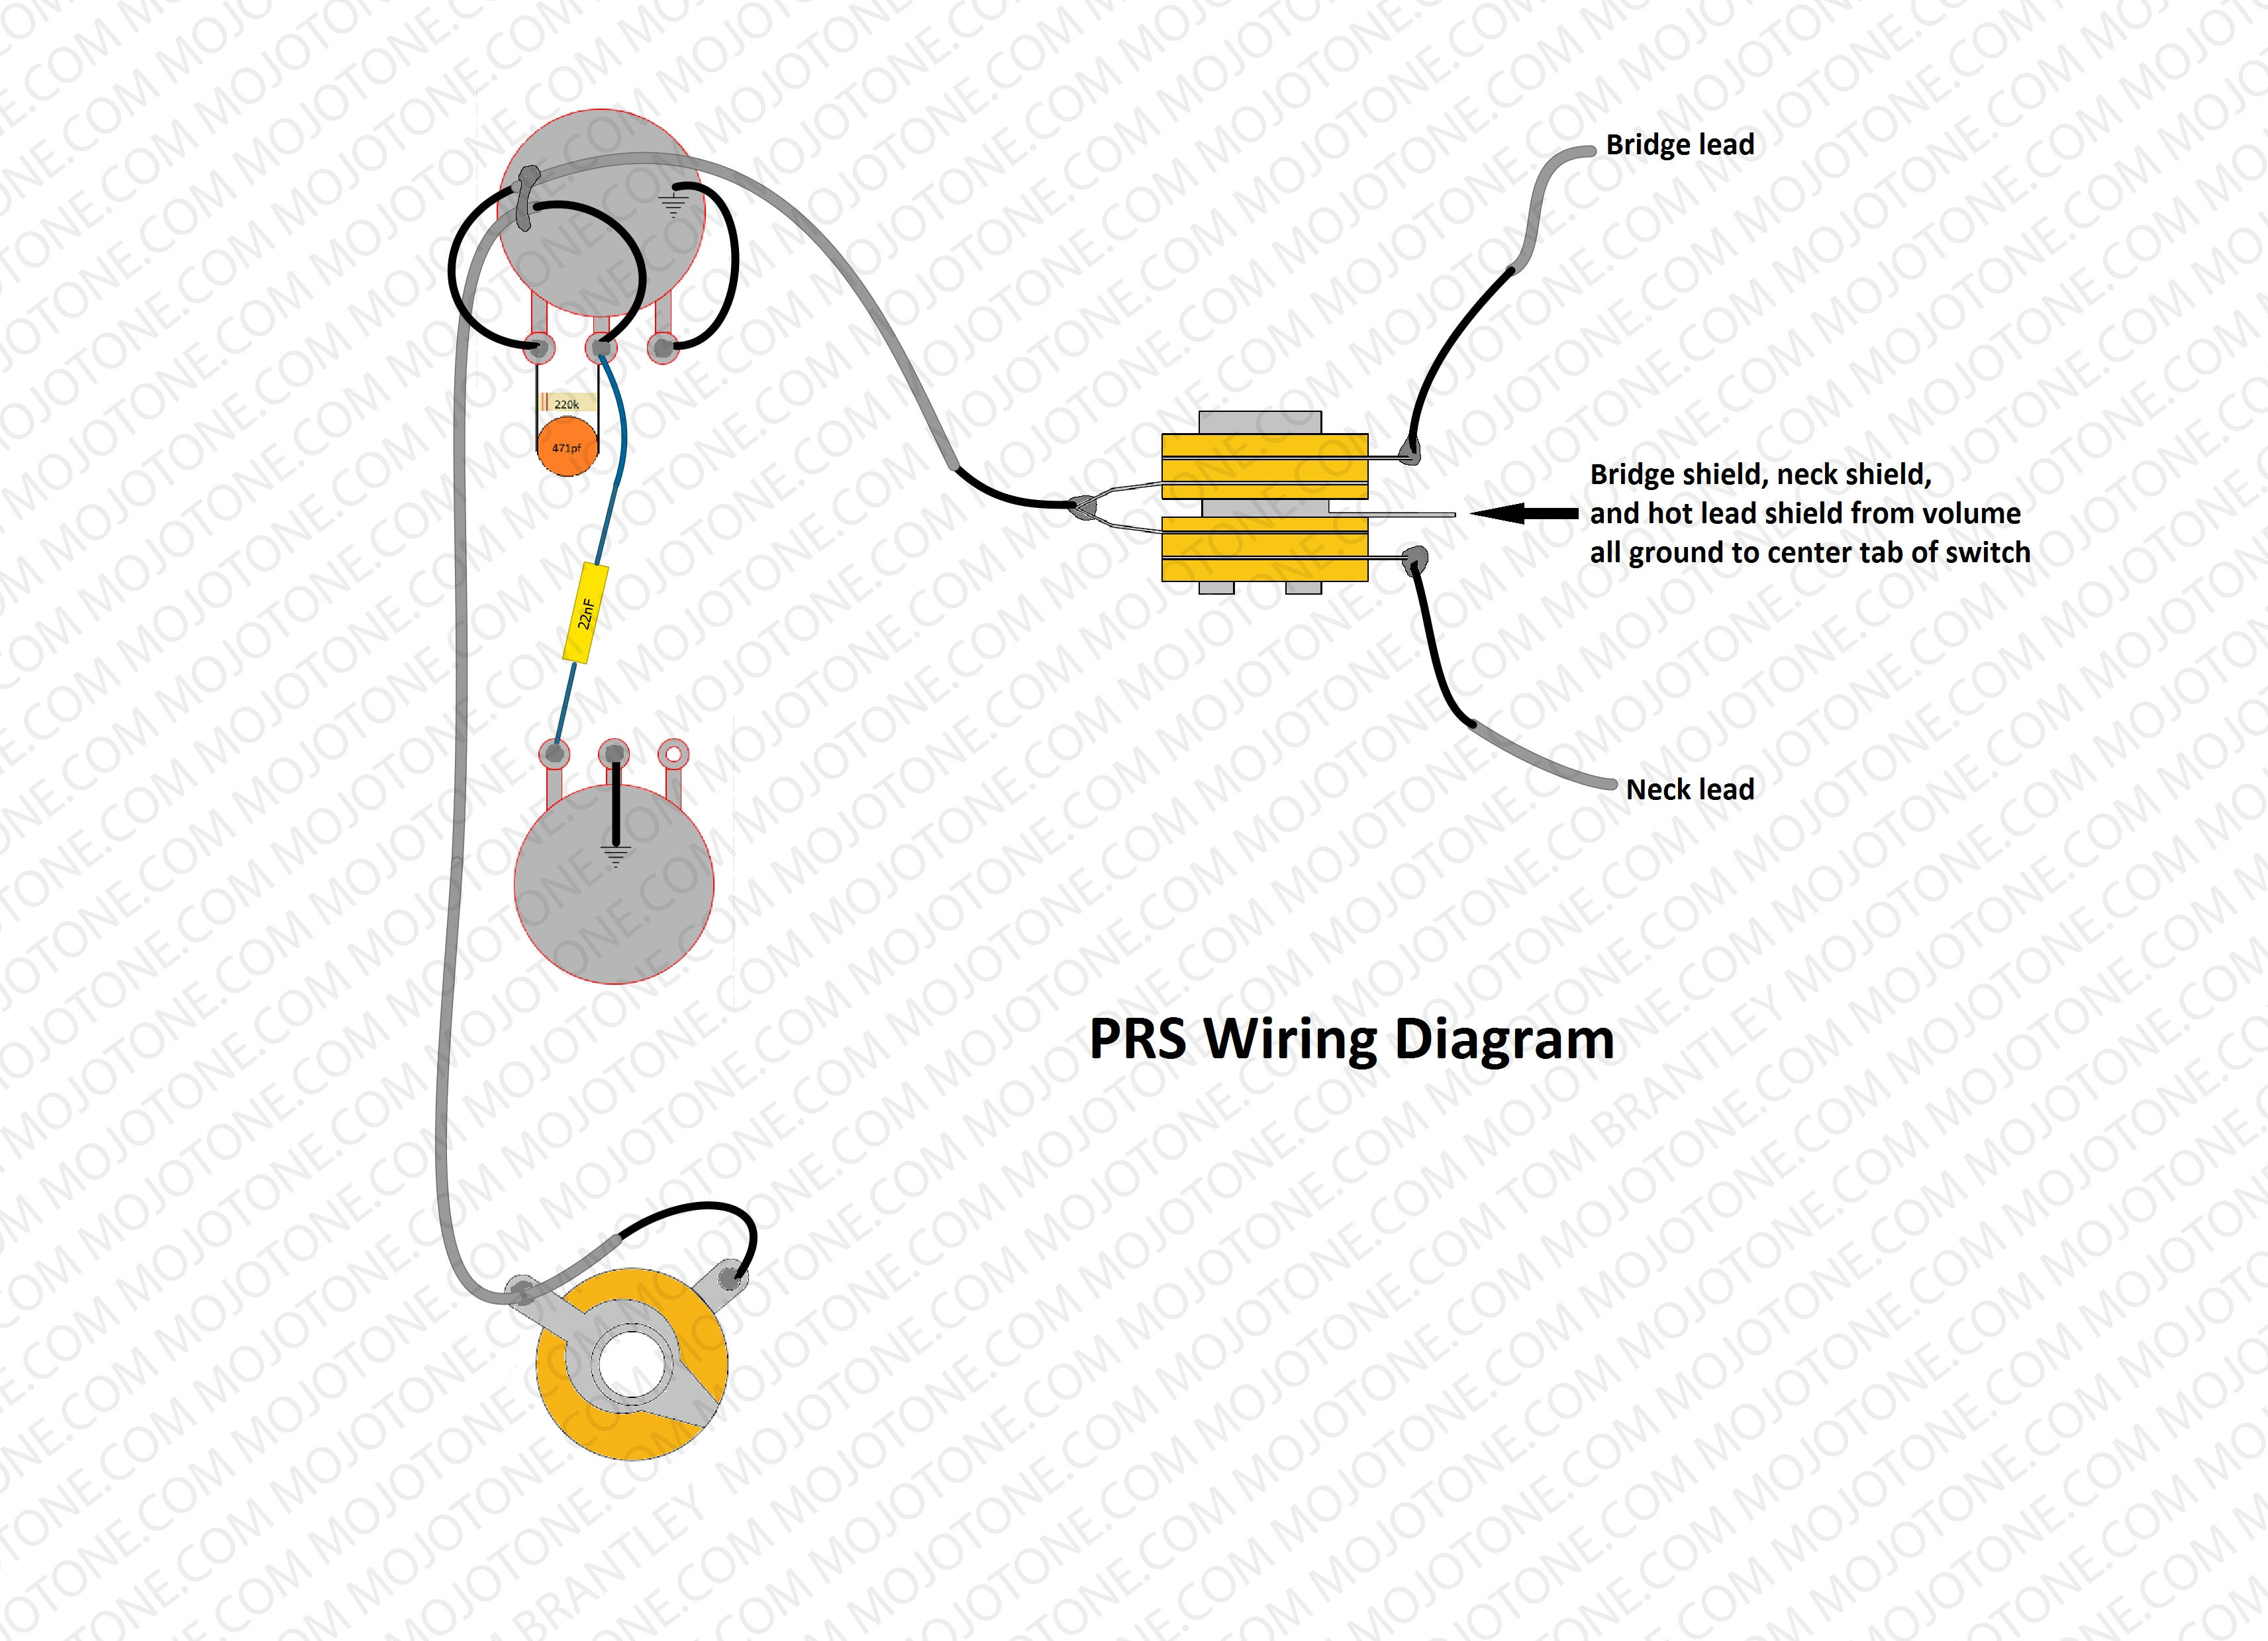 [EQHS_1162]  FE_2316] Prs Se Custom Guitar Wiring Diagrams   Wiring Diagram Prs Sc245      Ricis Crove Greas Benkeme Mohammedshrine Librar Wiring 101